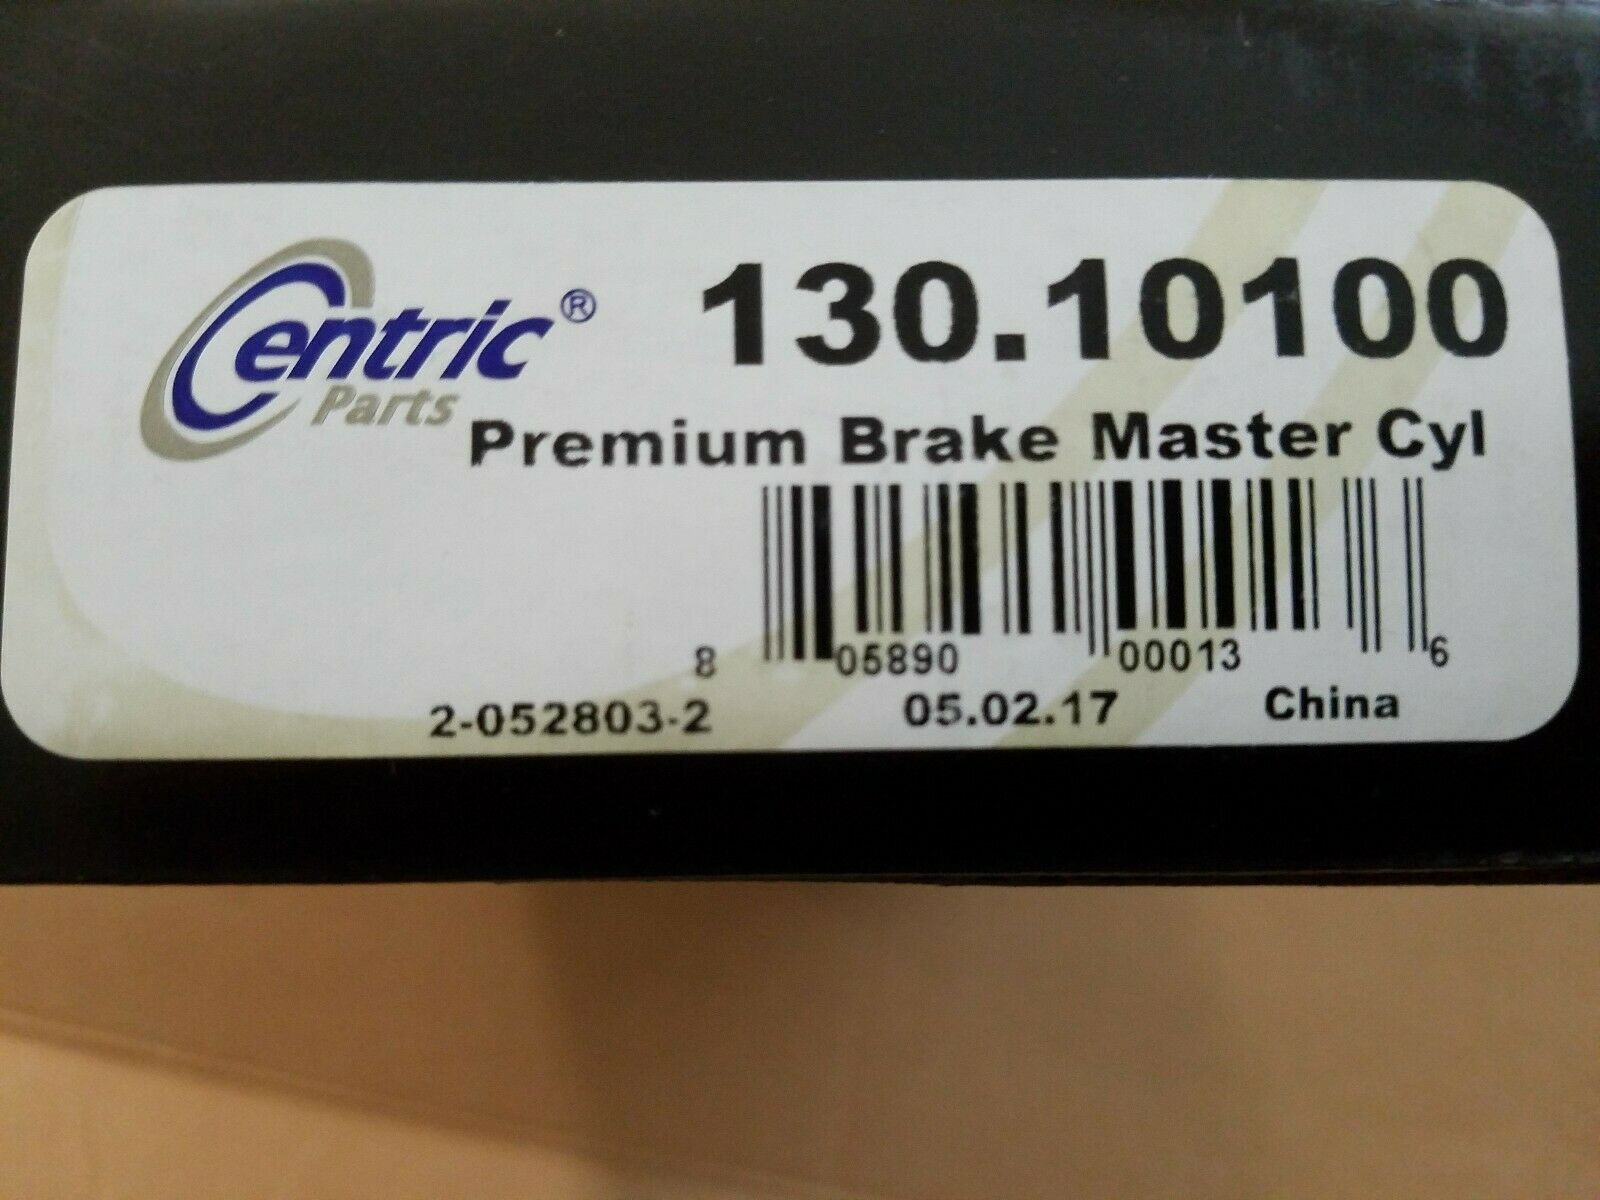 Preferred Centric 130.10100 Brake Master Cylinder-Premium Master Cylinder